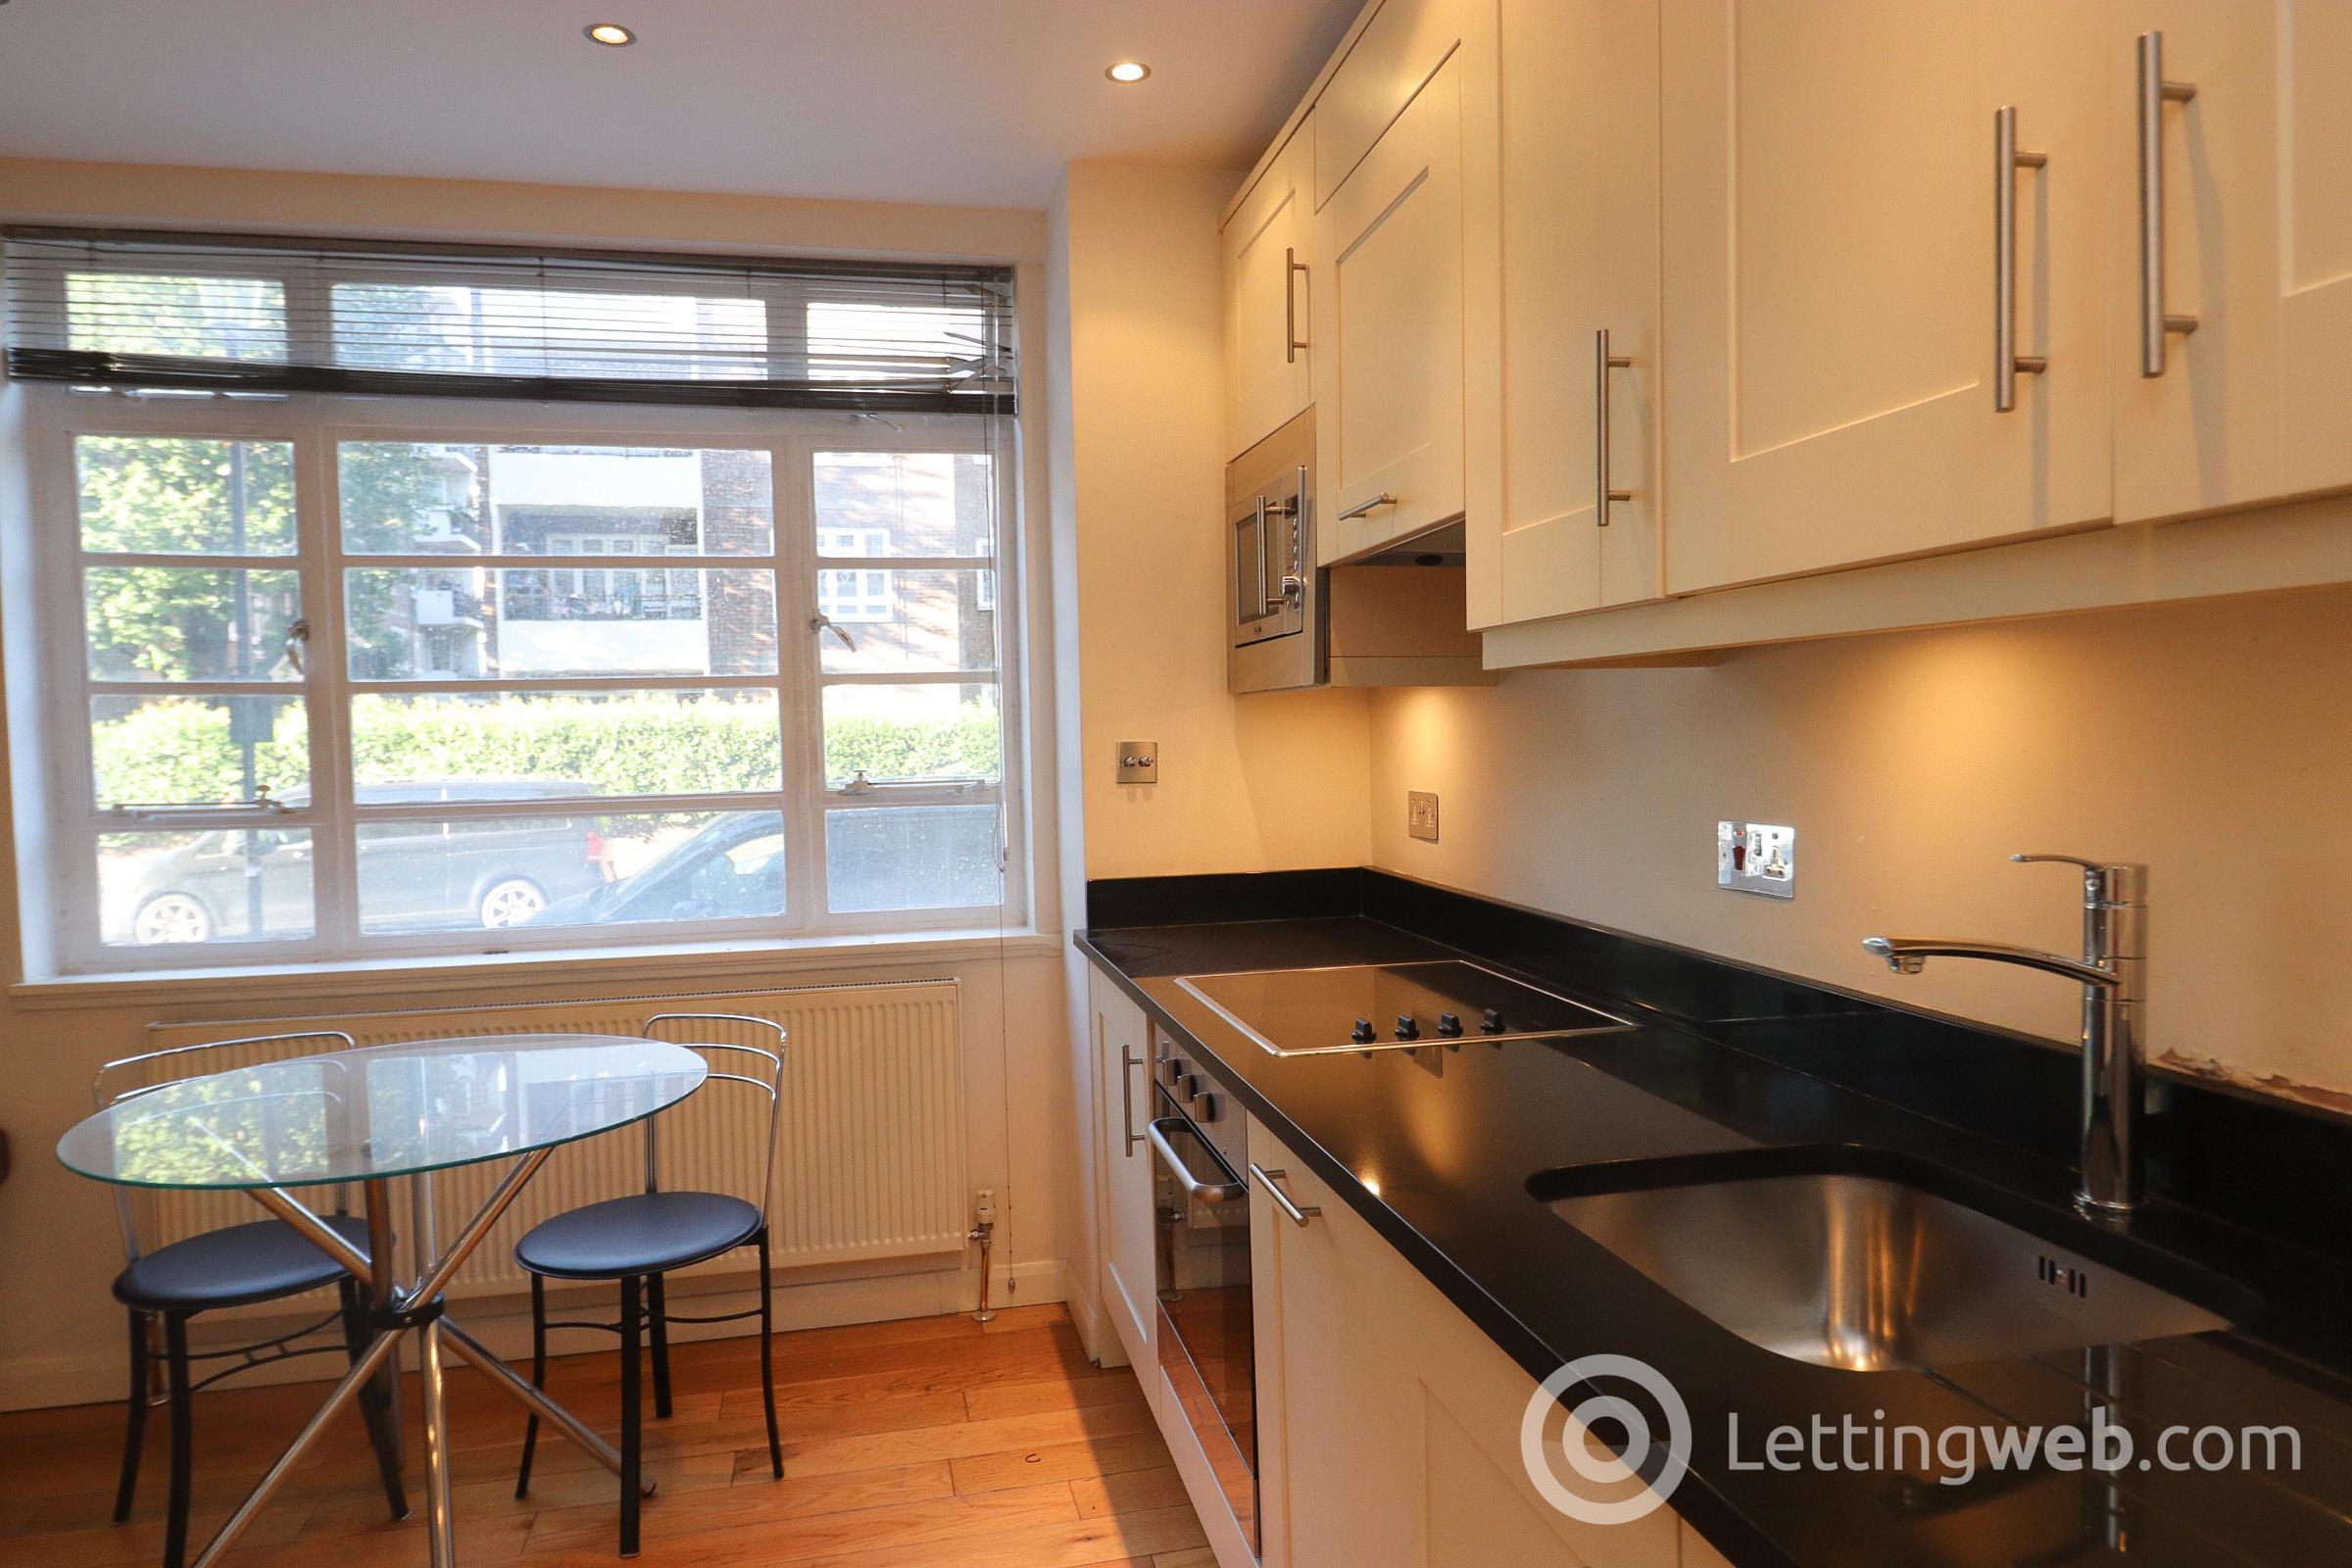 Property to rent in Nell Gwynn House, Sloane Avenue, London SW3 3AU